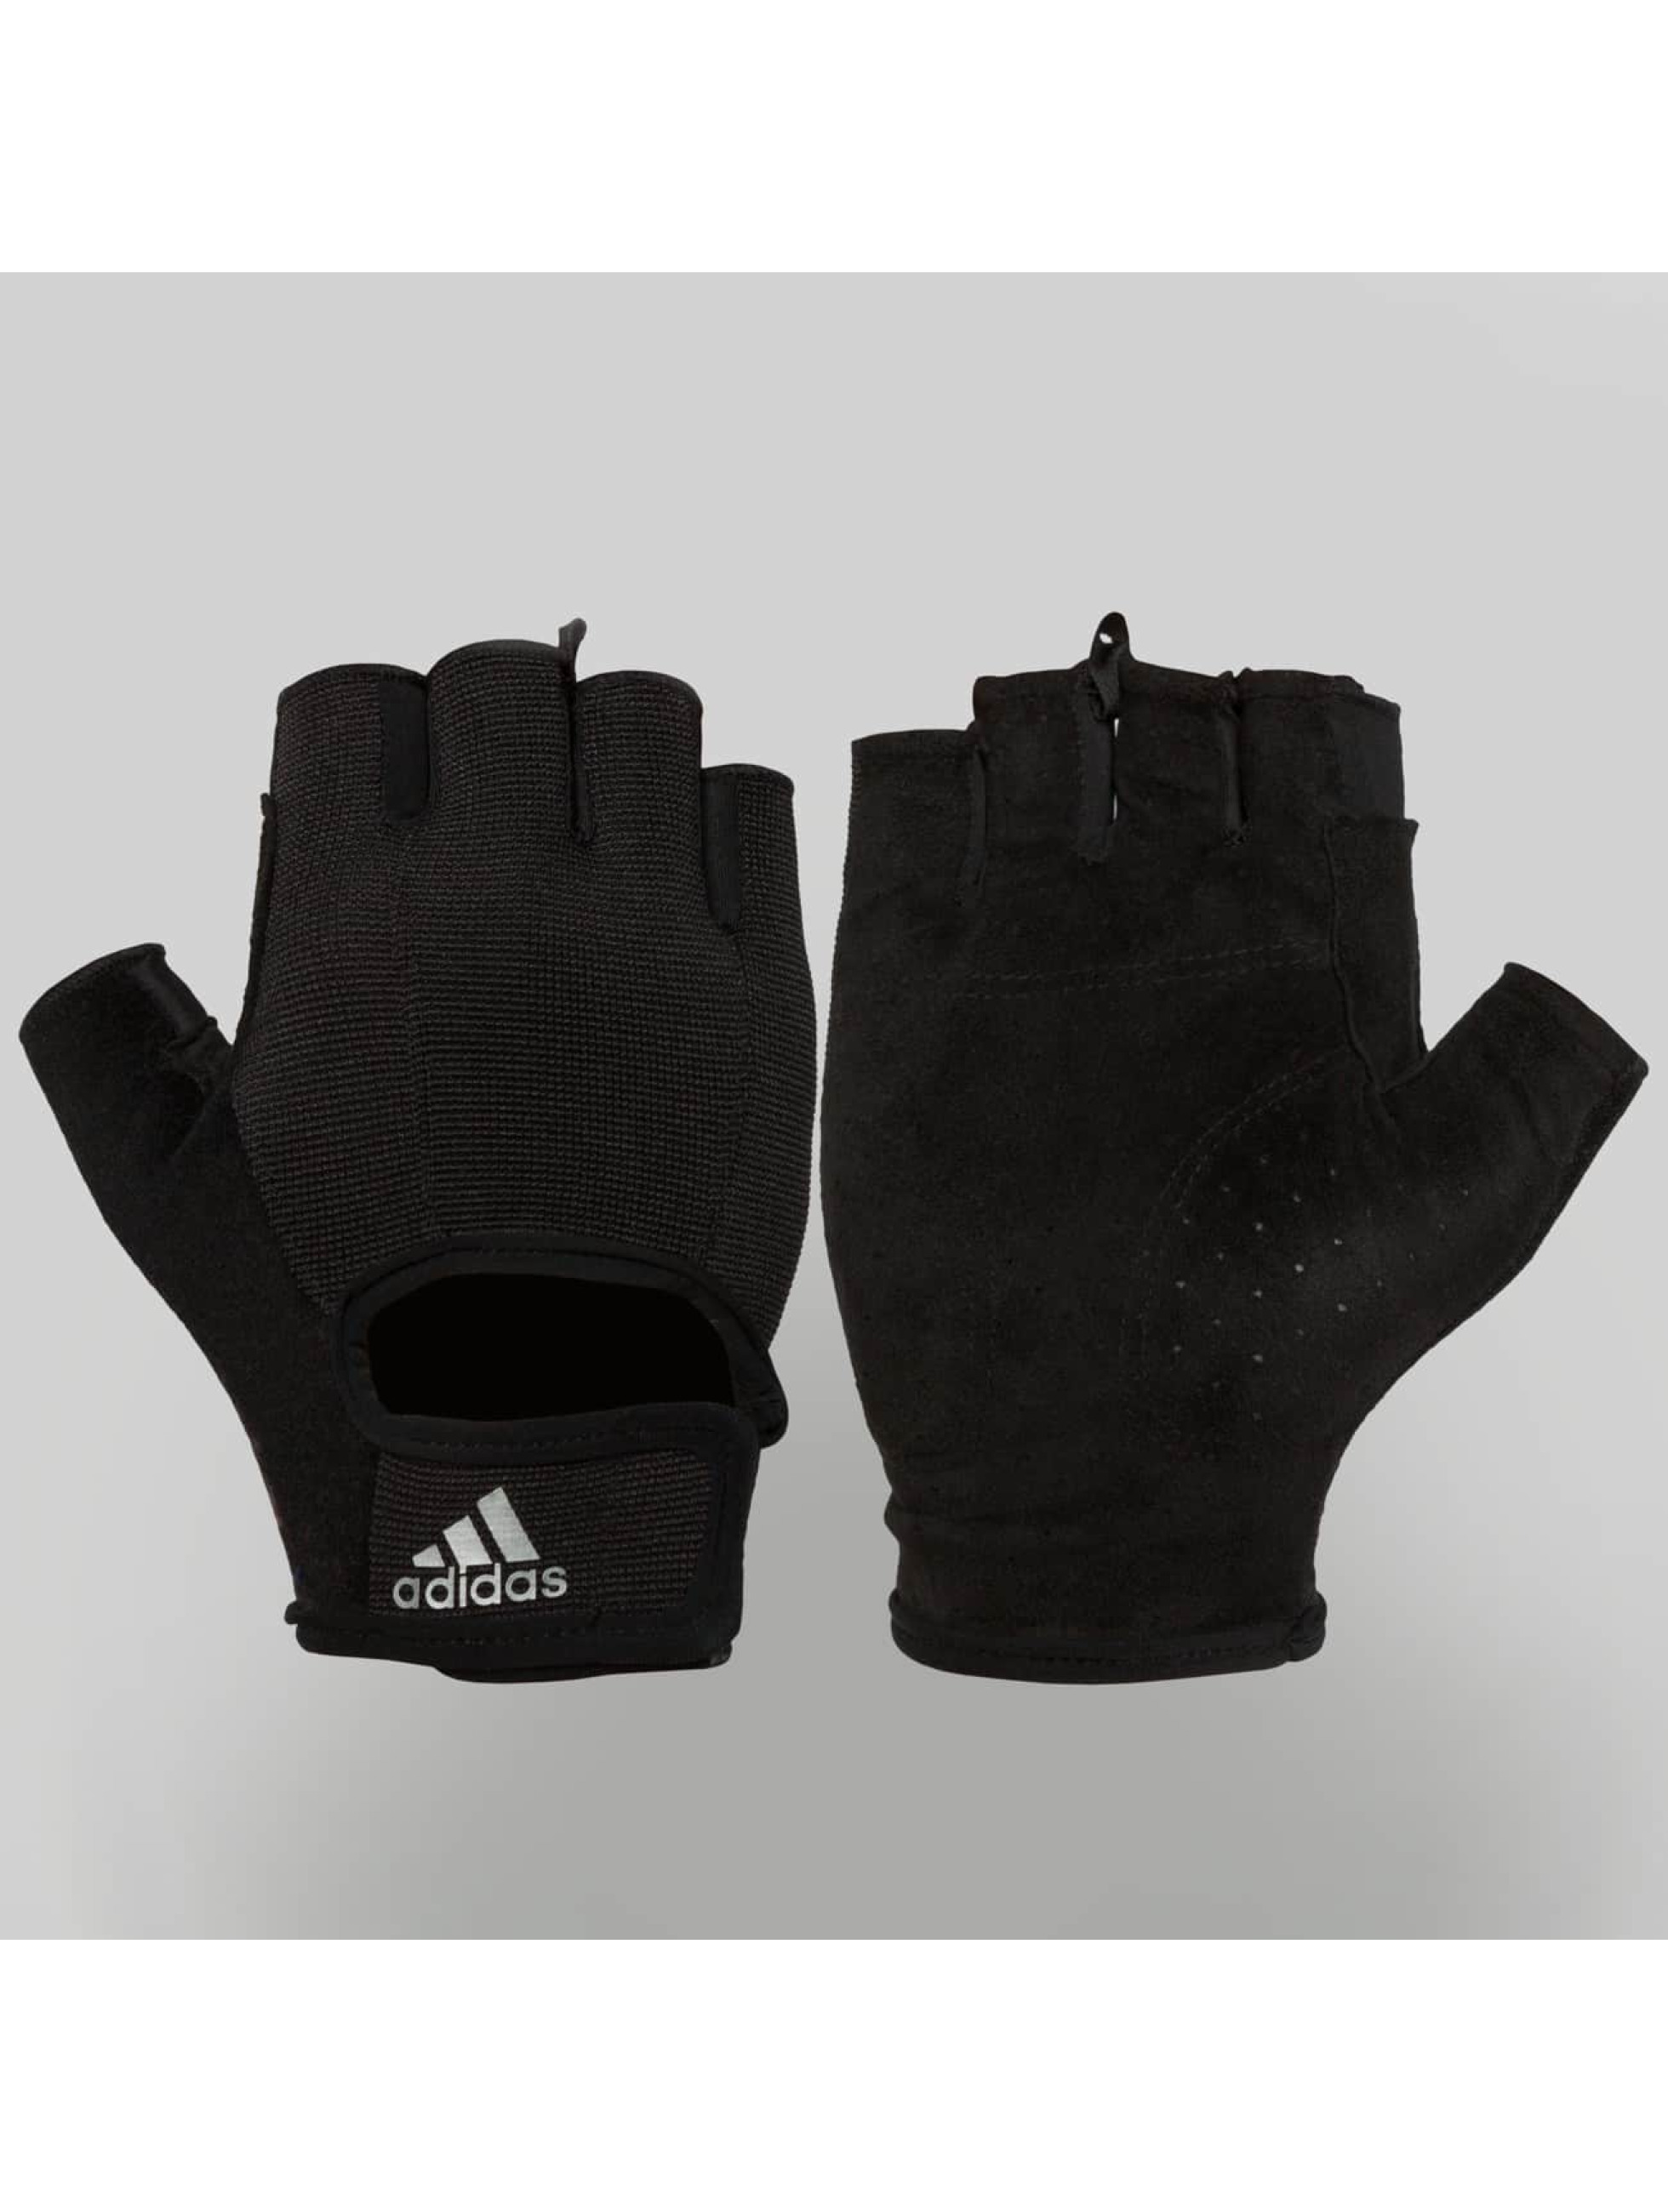 adidas Performance Gants Performance Versatile Clite noir